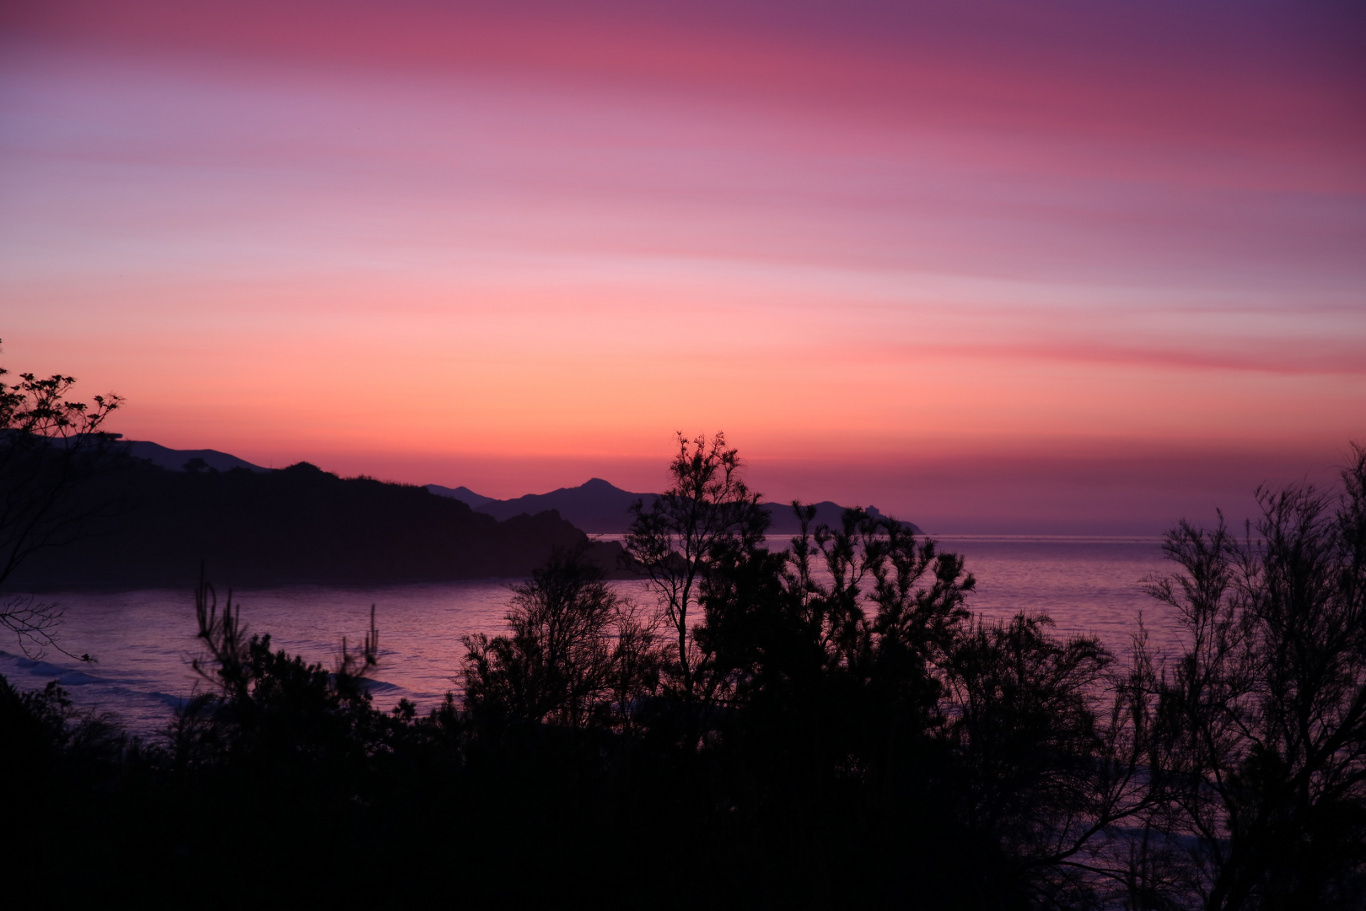 Sunrise seen from the Majon Bathing resort near Hamhung in North Korea (DPRK)